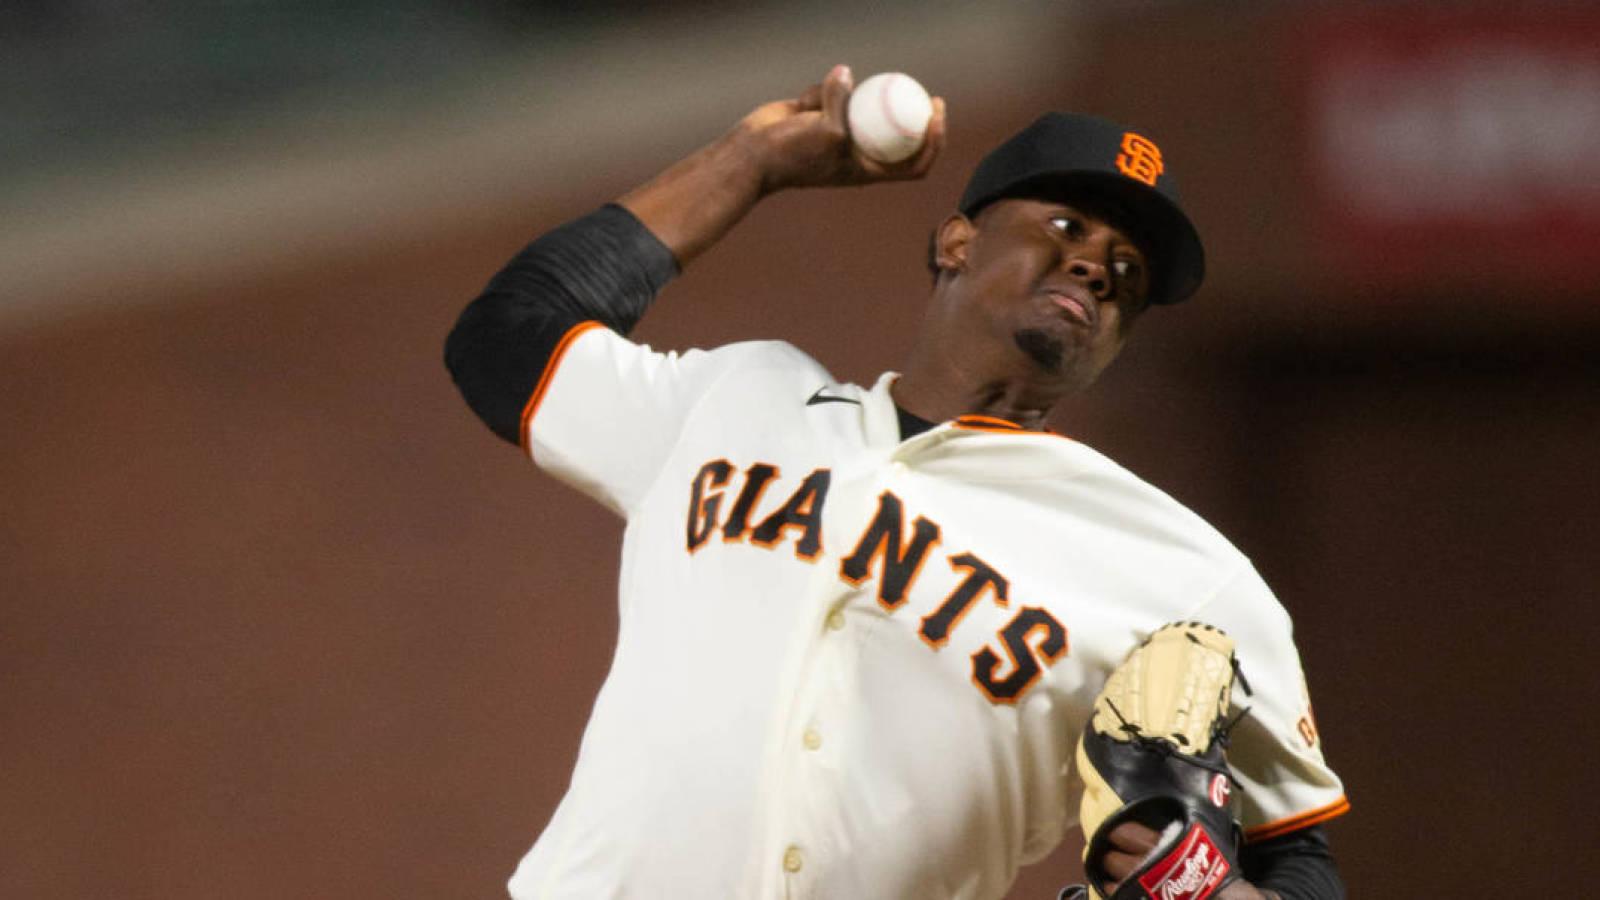 MLB suspende 80 partidos por dopaje a pitcher dominicano de Gigantes